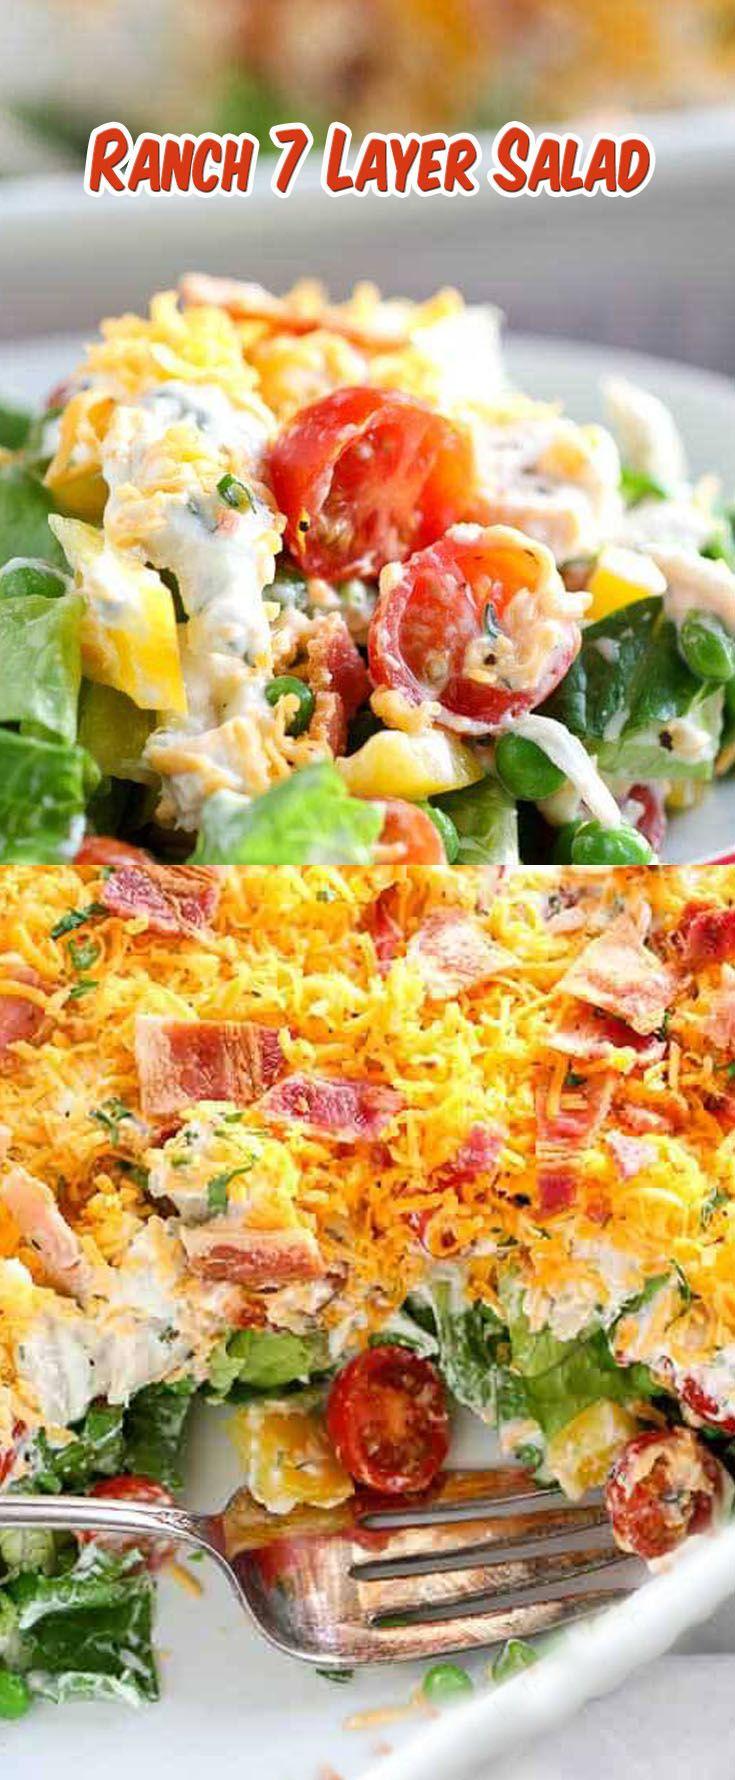 Ranch 7 Layer Salad